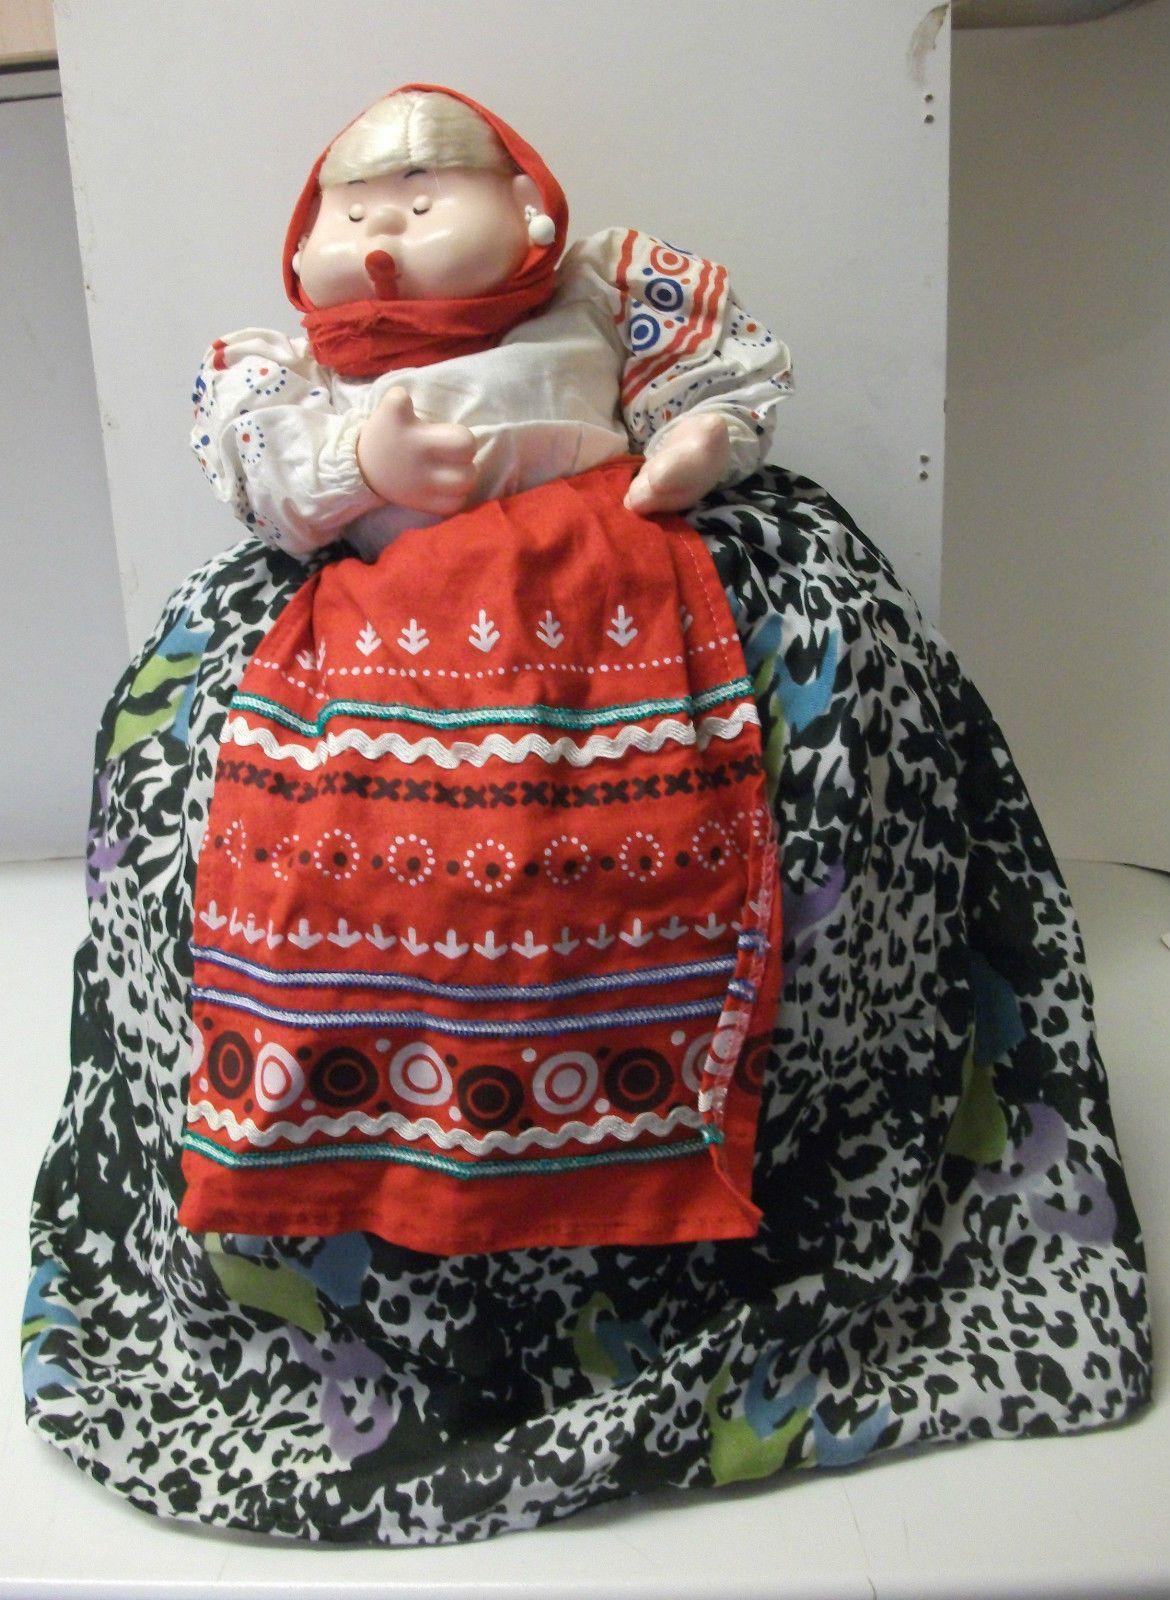 Vintage Russian Samovar Doll Tea Warmer Cozy Large | 15+5.99